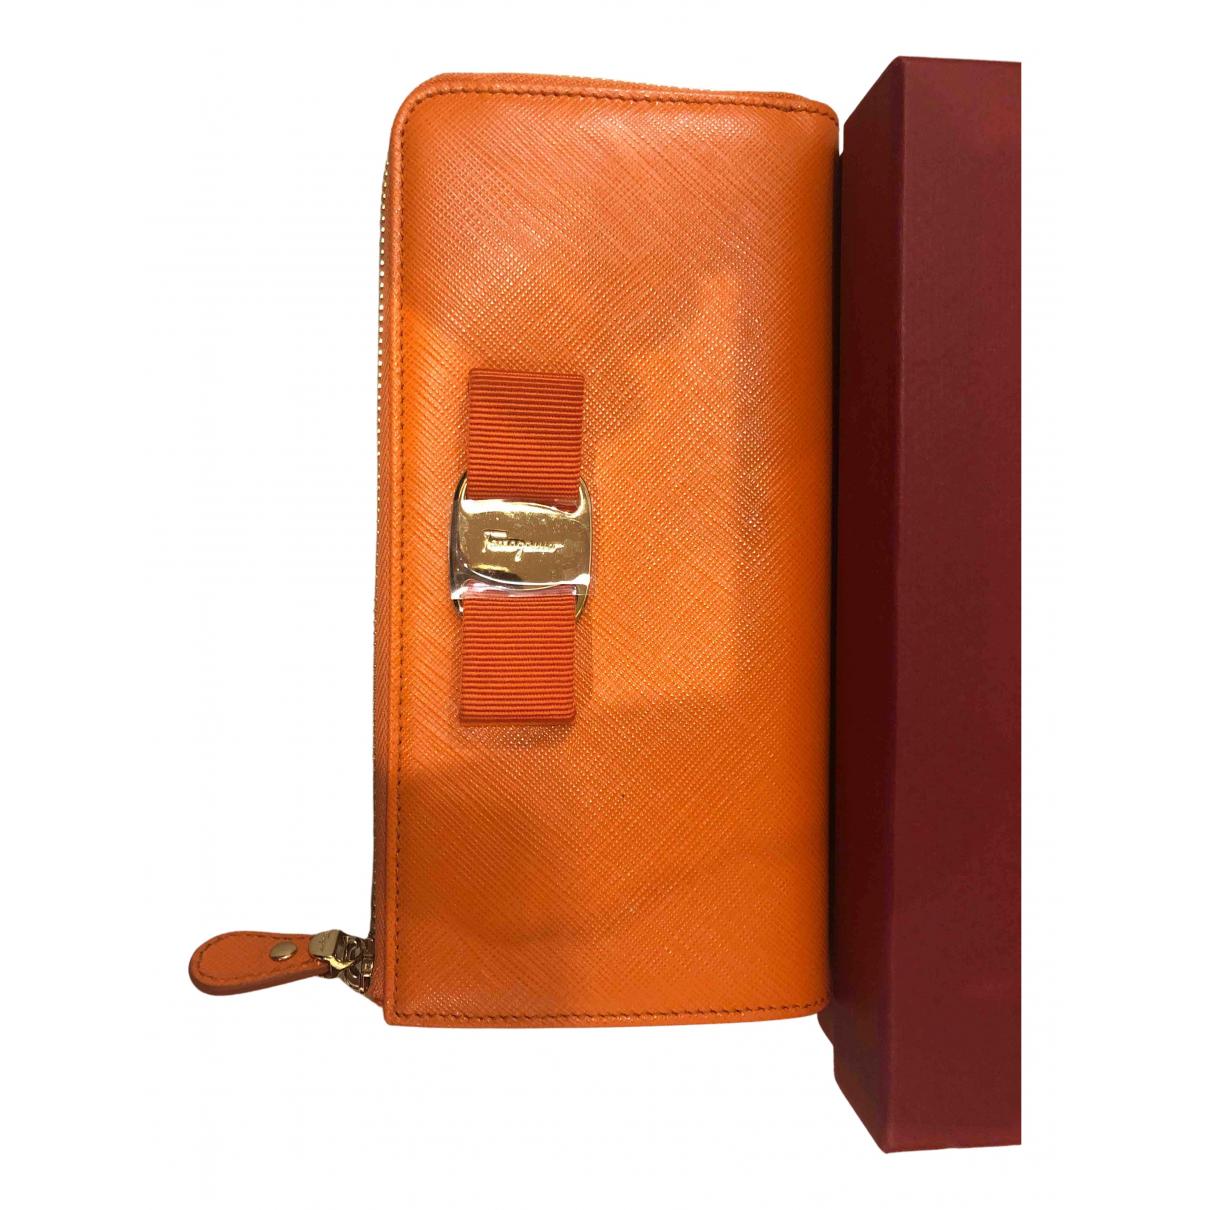 Salvatore Ferragamo N Orange wallet for Women N